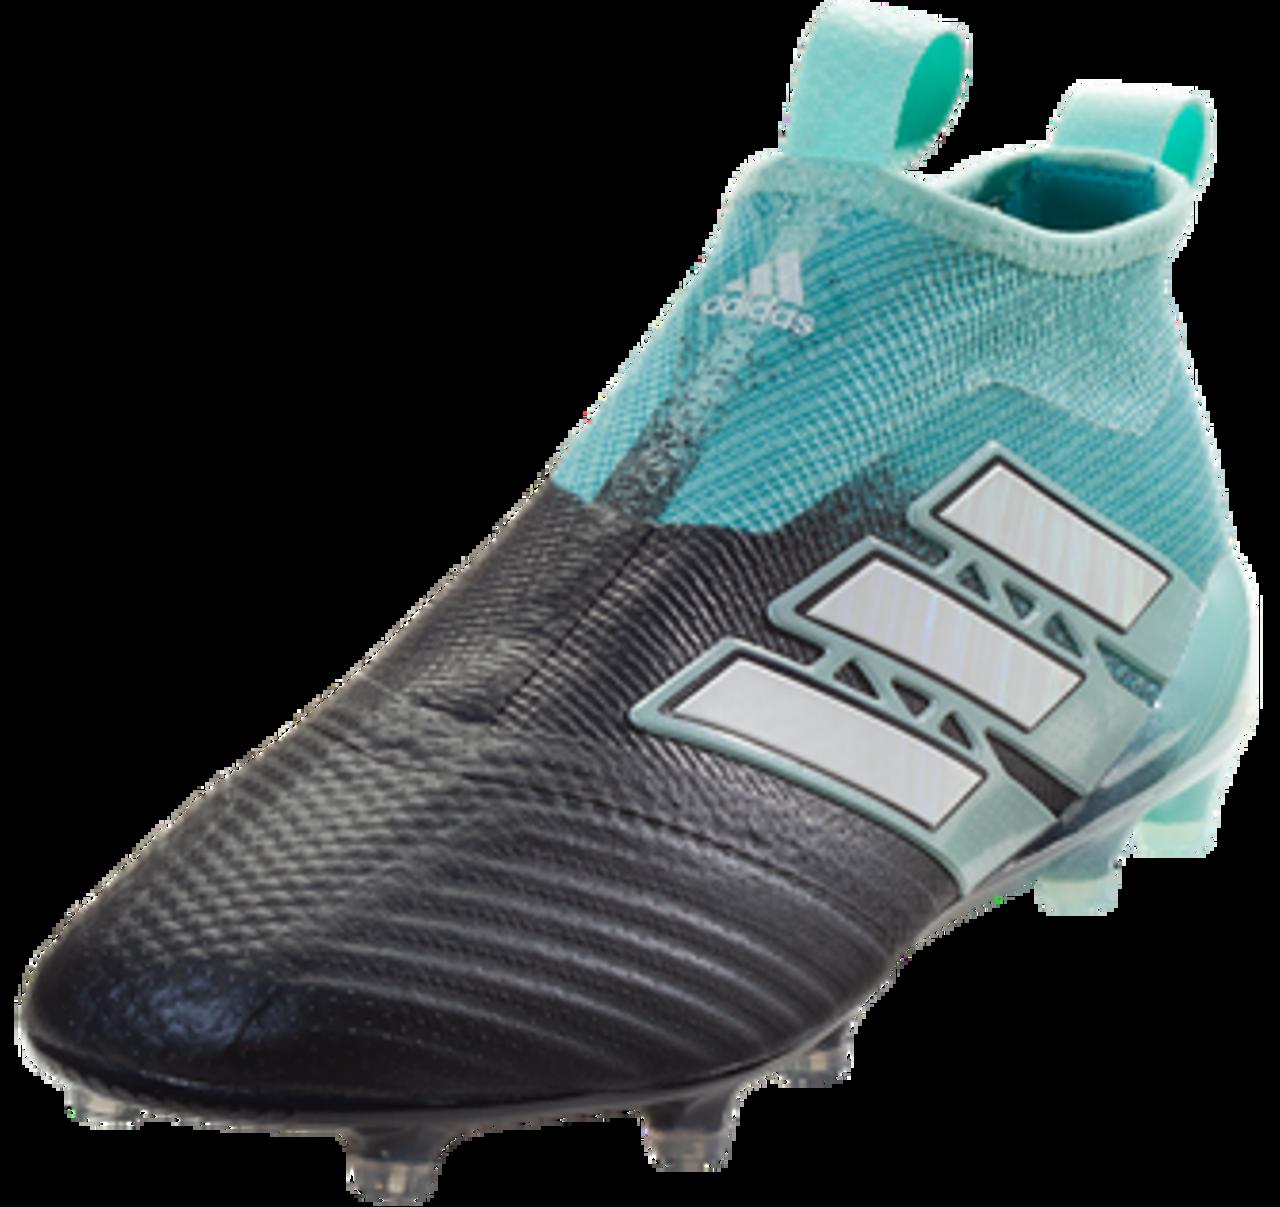 ADIDAS ACE 17+ PURECONTROL FG Soccer Cleat - Every Aqua